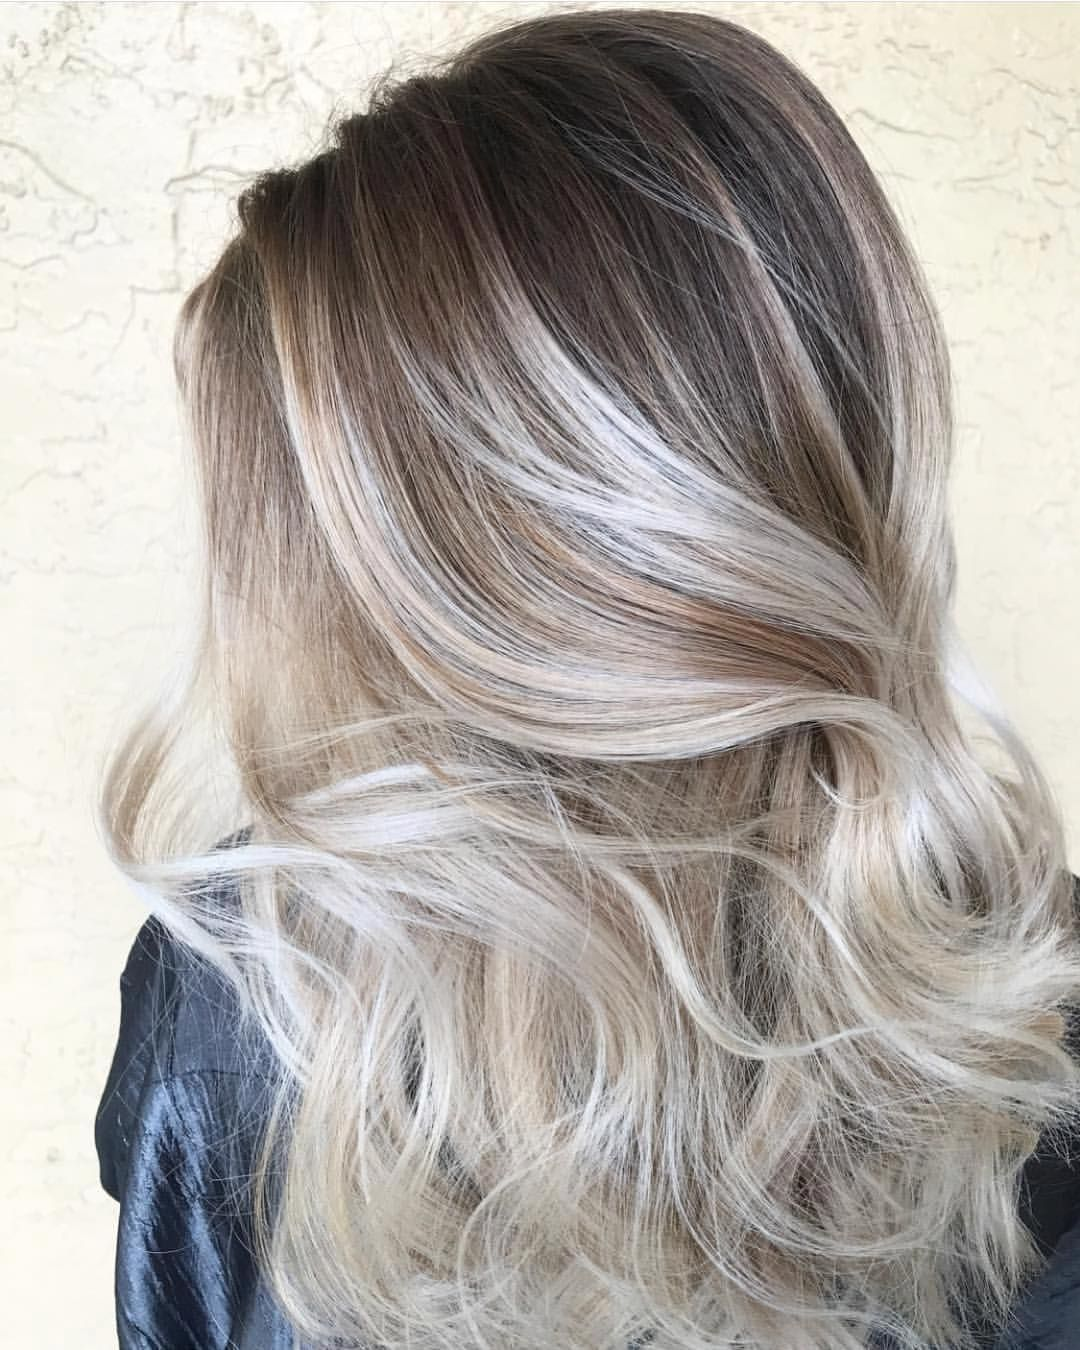 Best Of Balayage Hair Bestofbalayage S Instagram Post